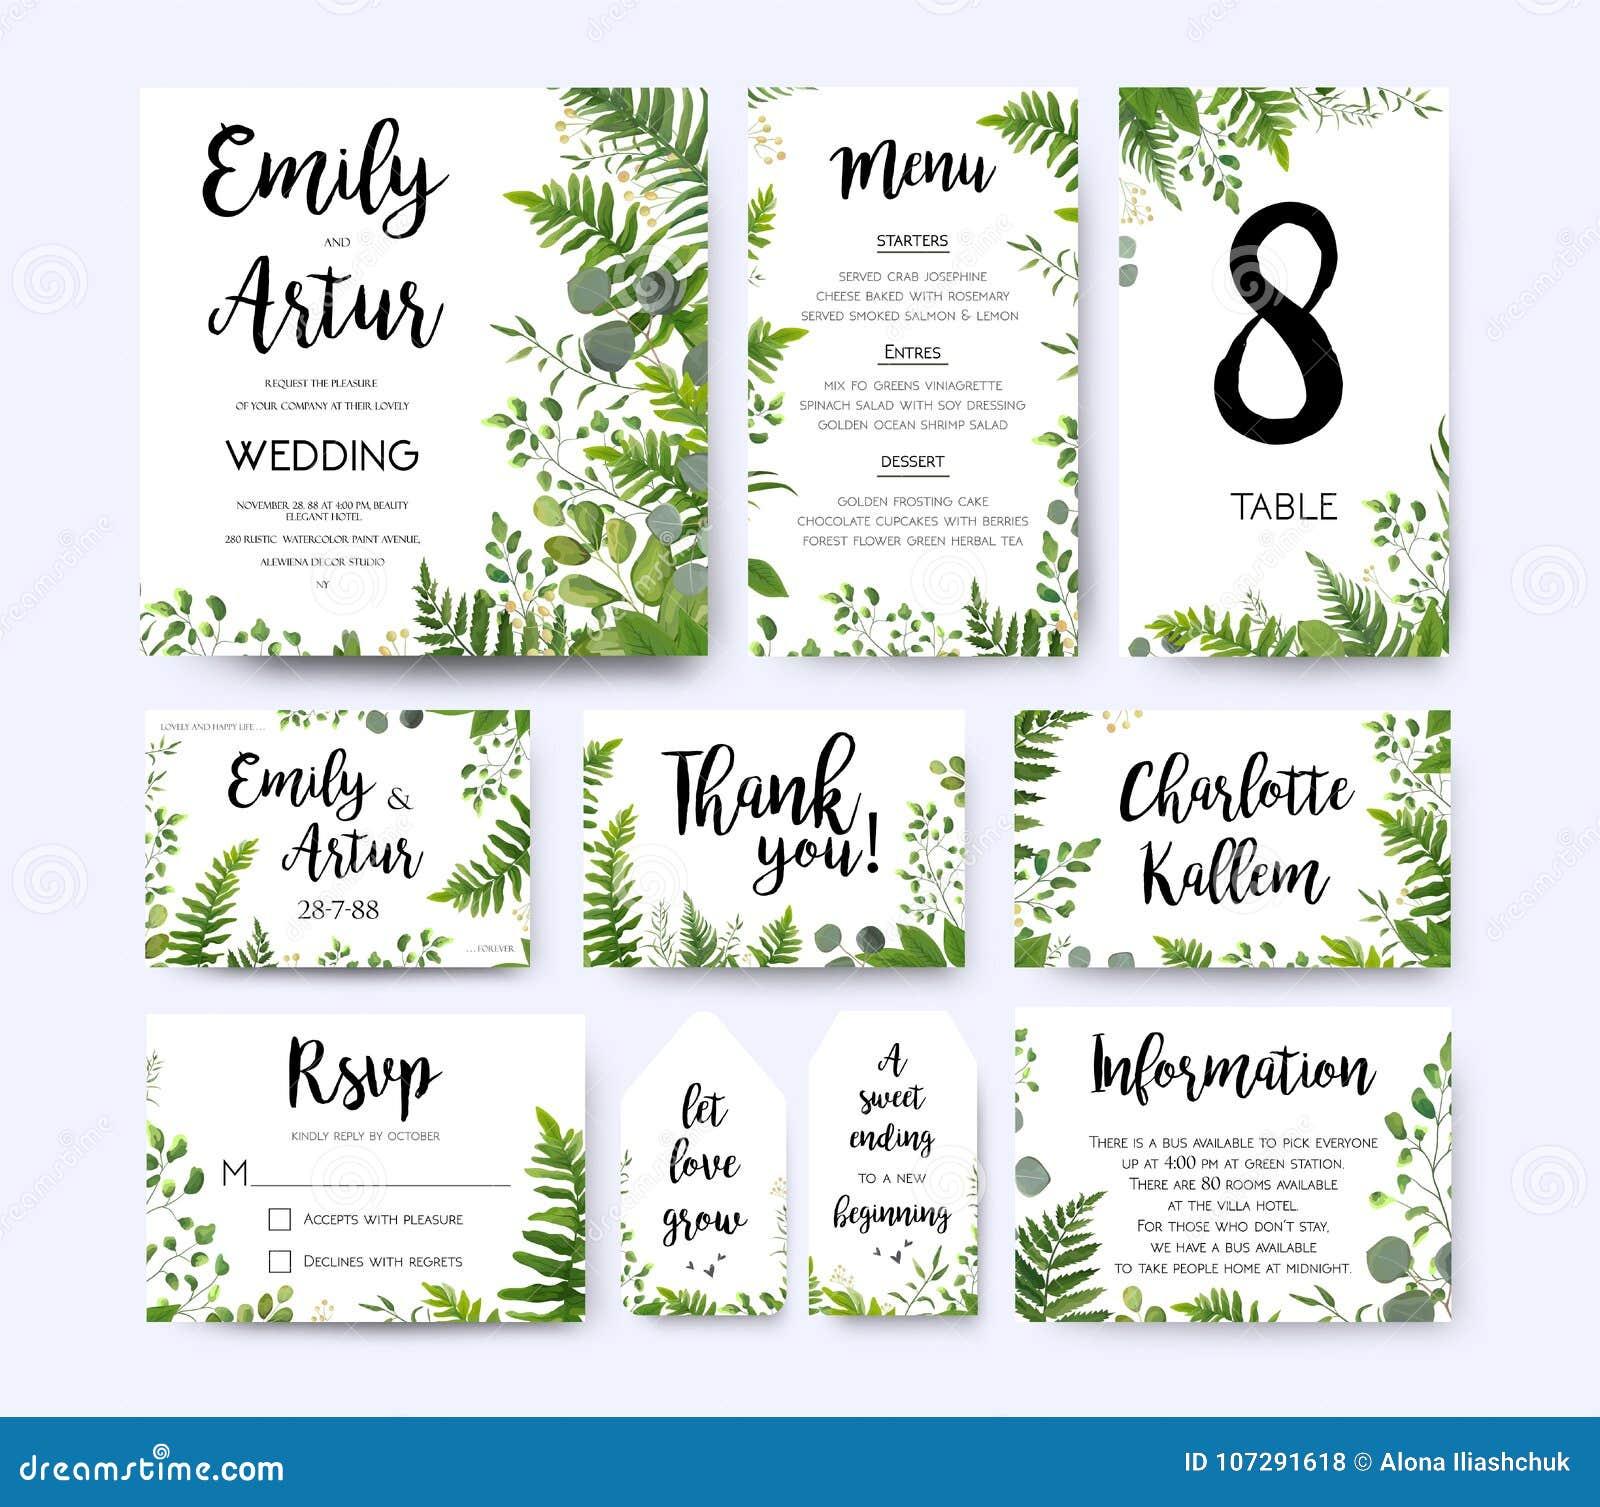 Wedding invite, invitation menu rsvp thank you card vector flora